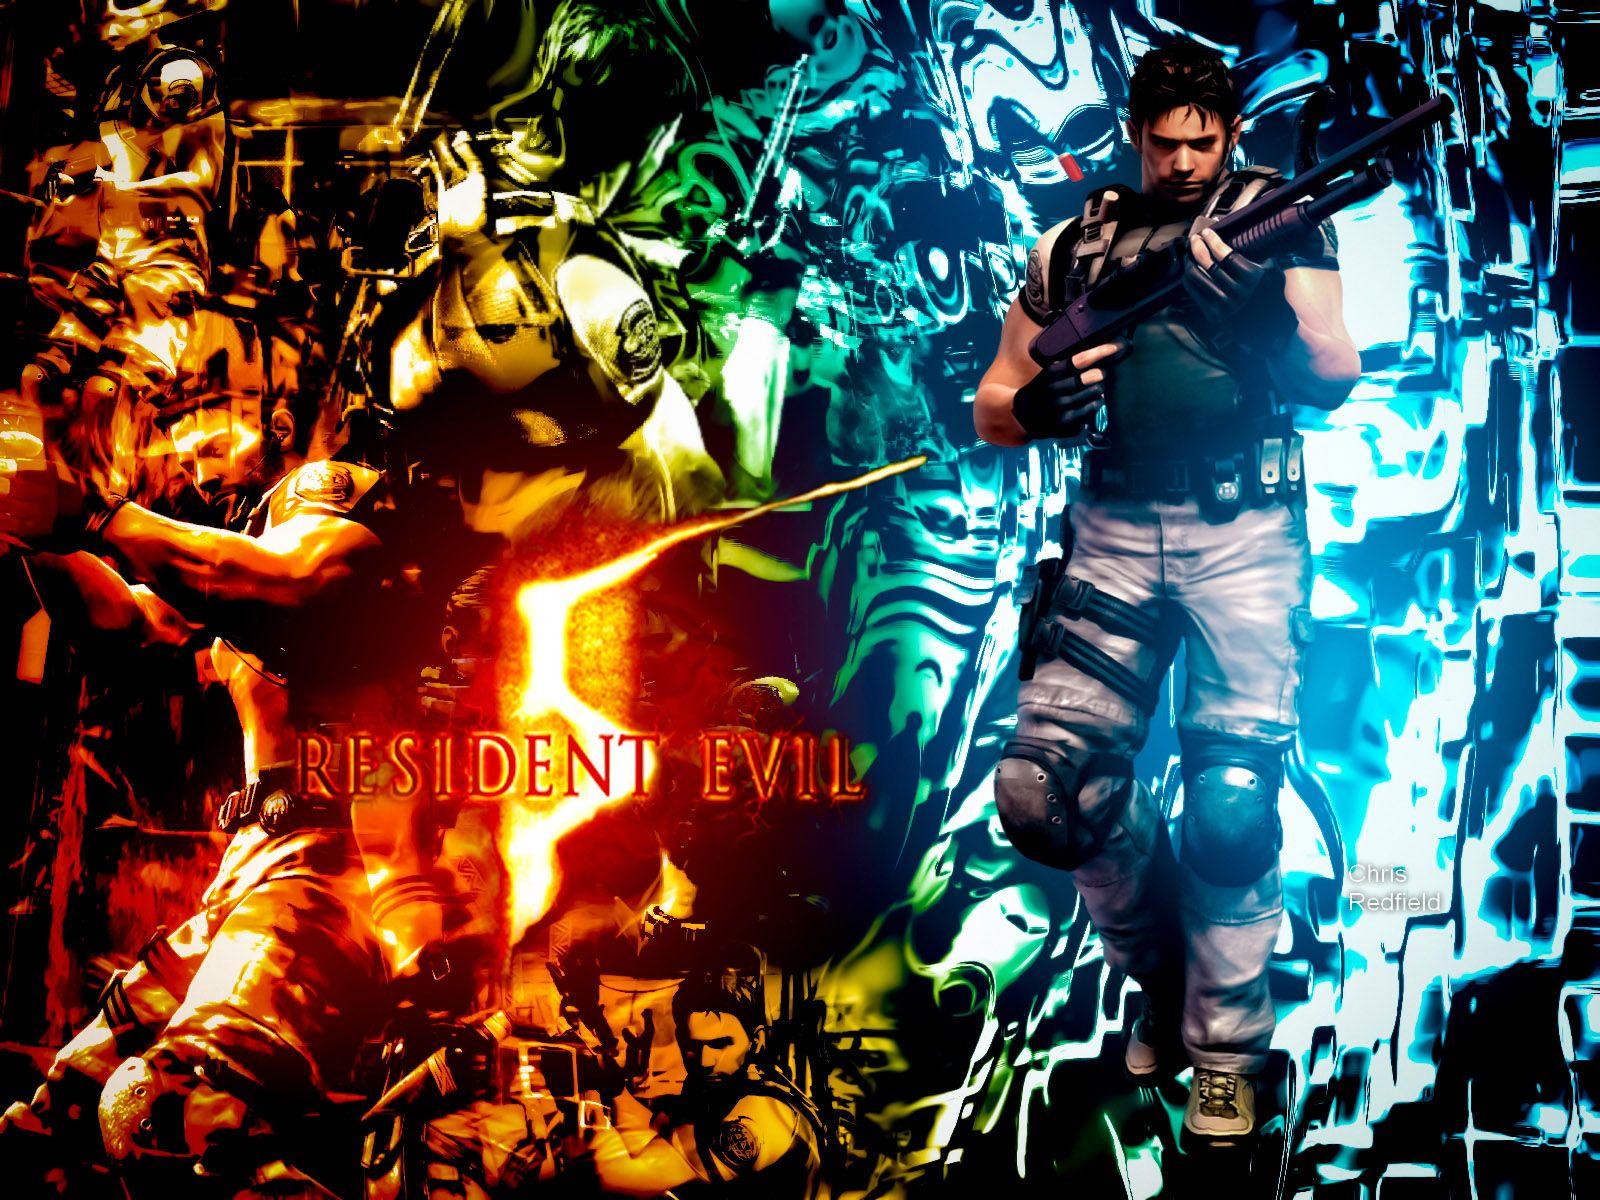 Pc Resident Evil 5 Wallpapers Hormazd Lamdin